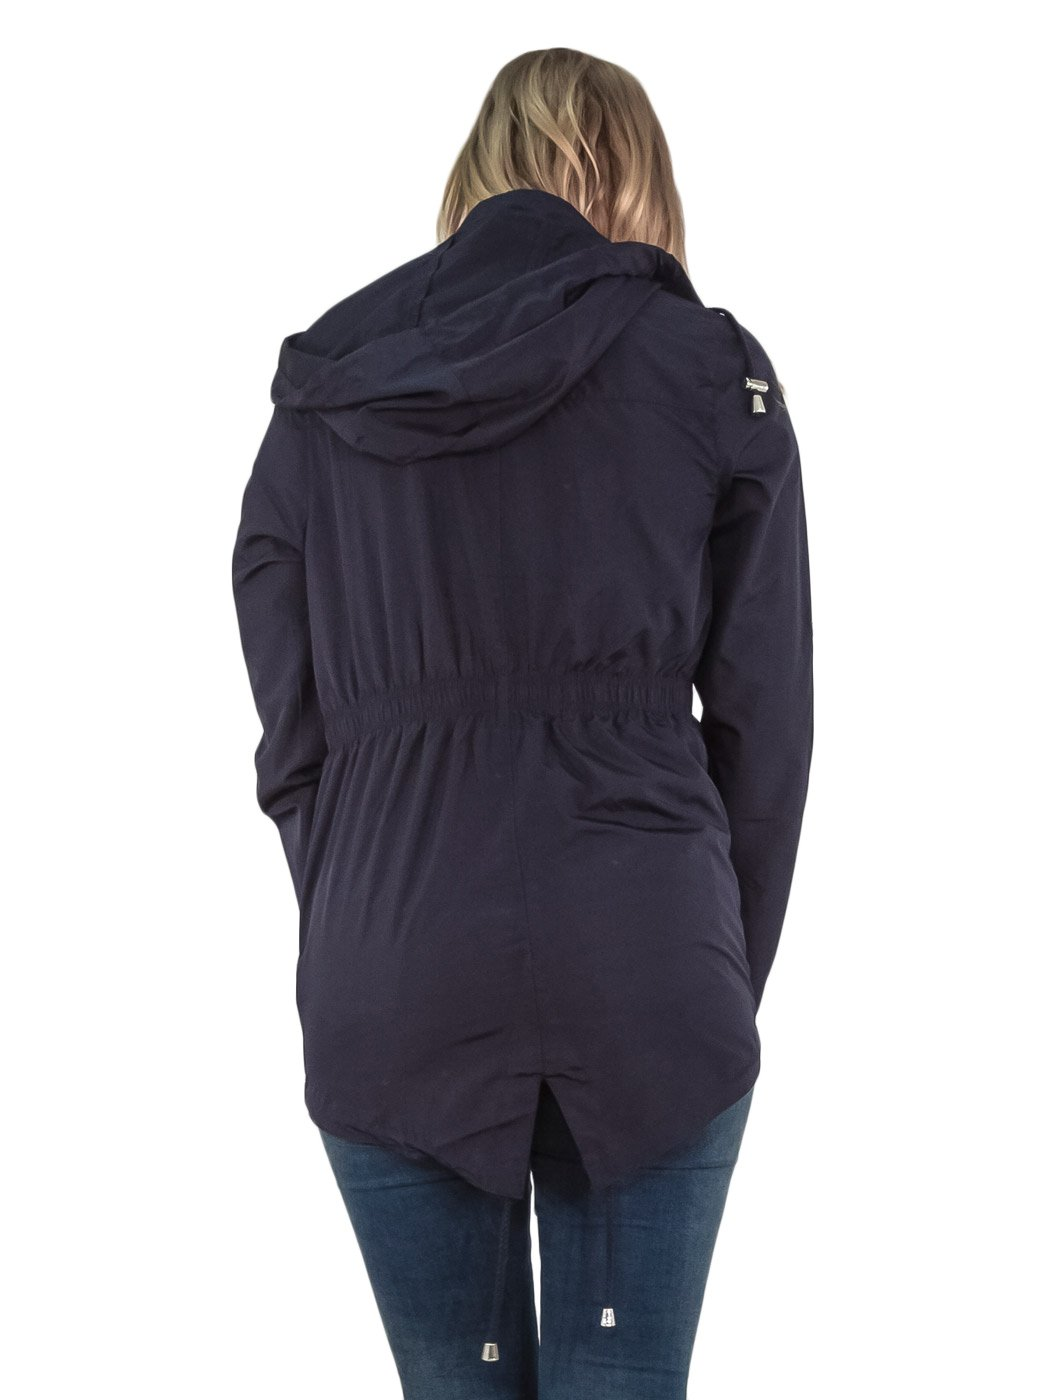 Womens-RainCoat-Plain-Hooded-Ladies-Jacket-Kagool-Parka-Long-Sleeves-Two-Pockets thumbnail 4